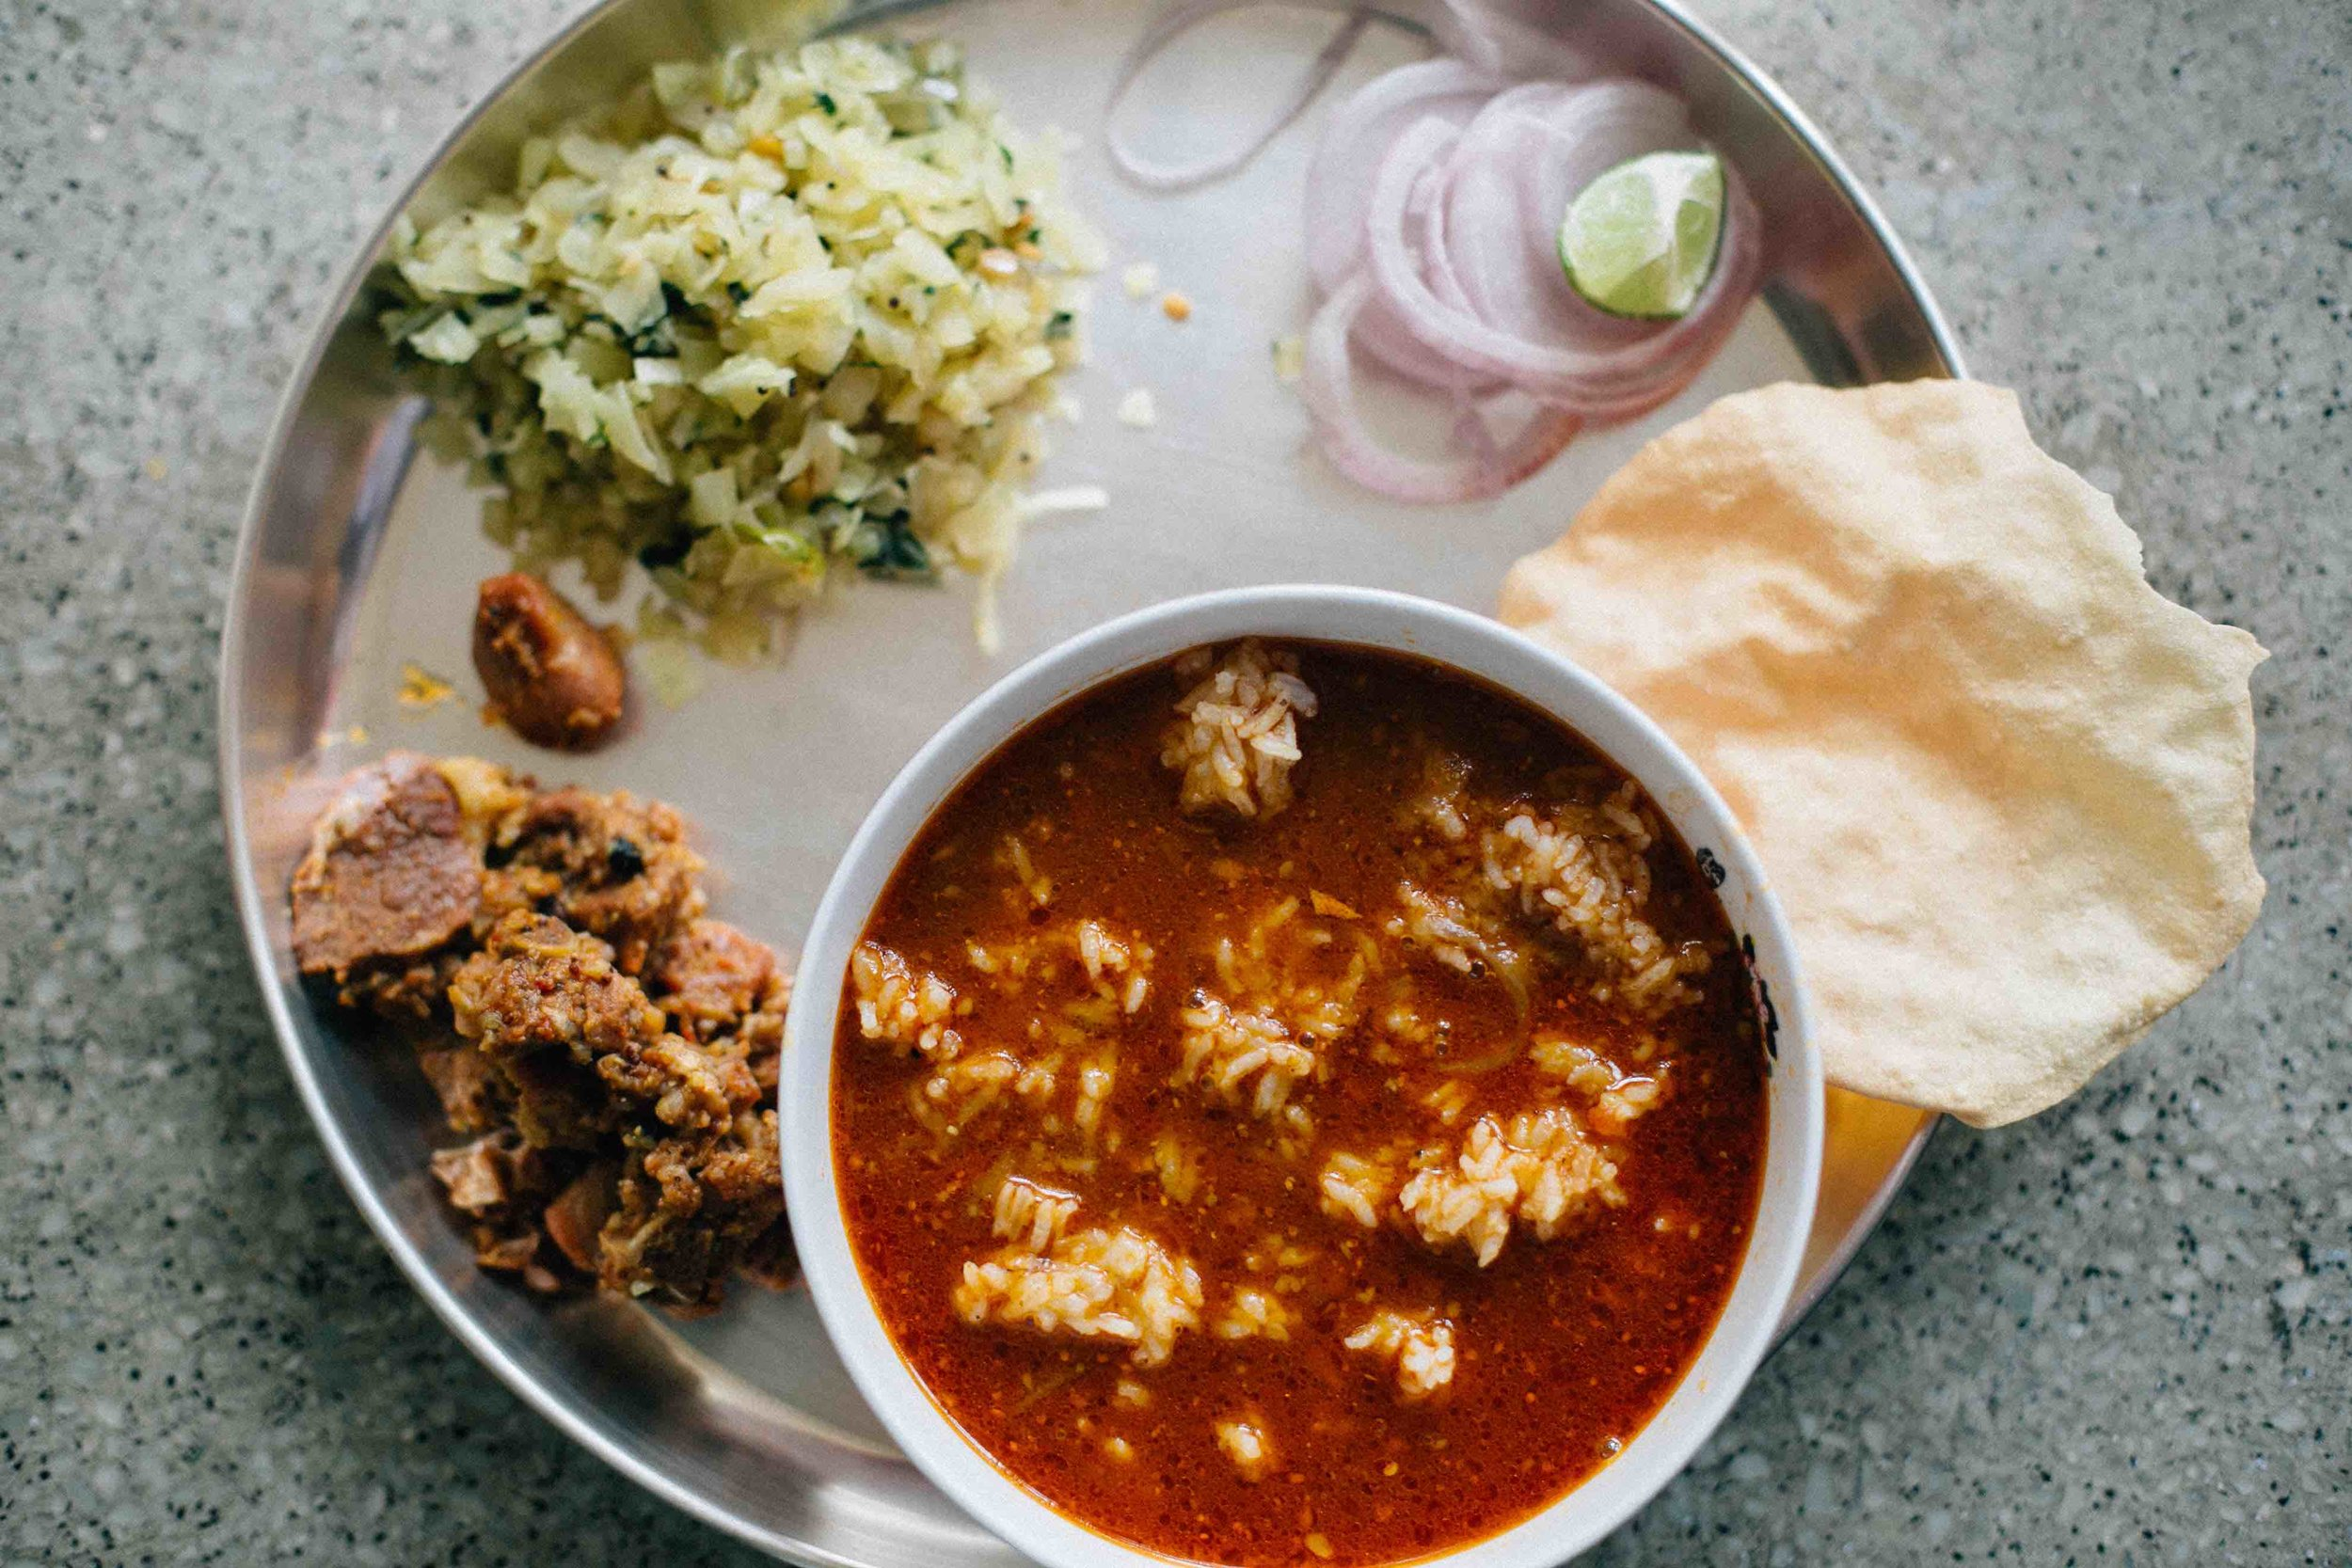 Ceylon curry recipe or mutton rasam for #1000Kitchens   Arathy Madappa, Bangalore